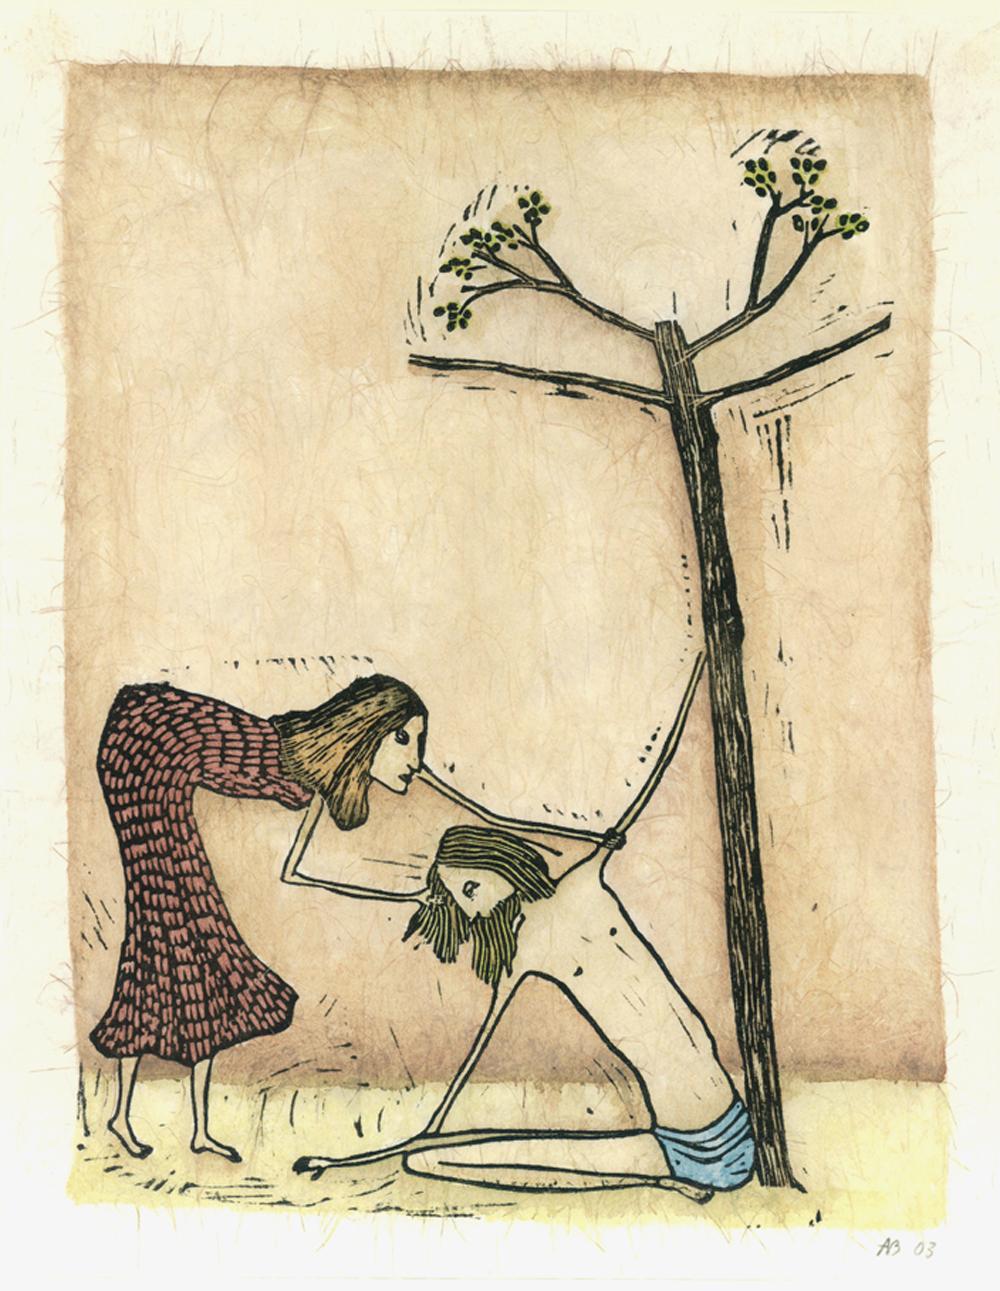 ...en de boom bloeit IV kruisweg ingekleurde linosnede